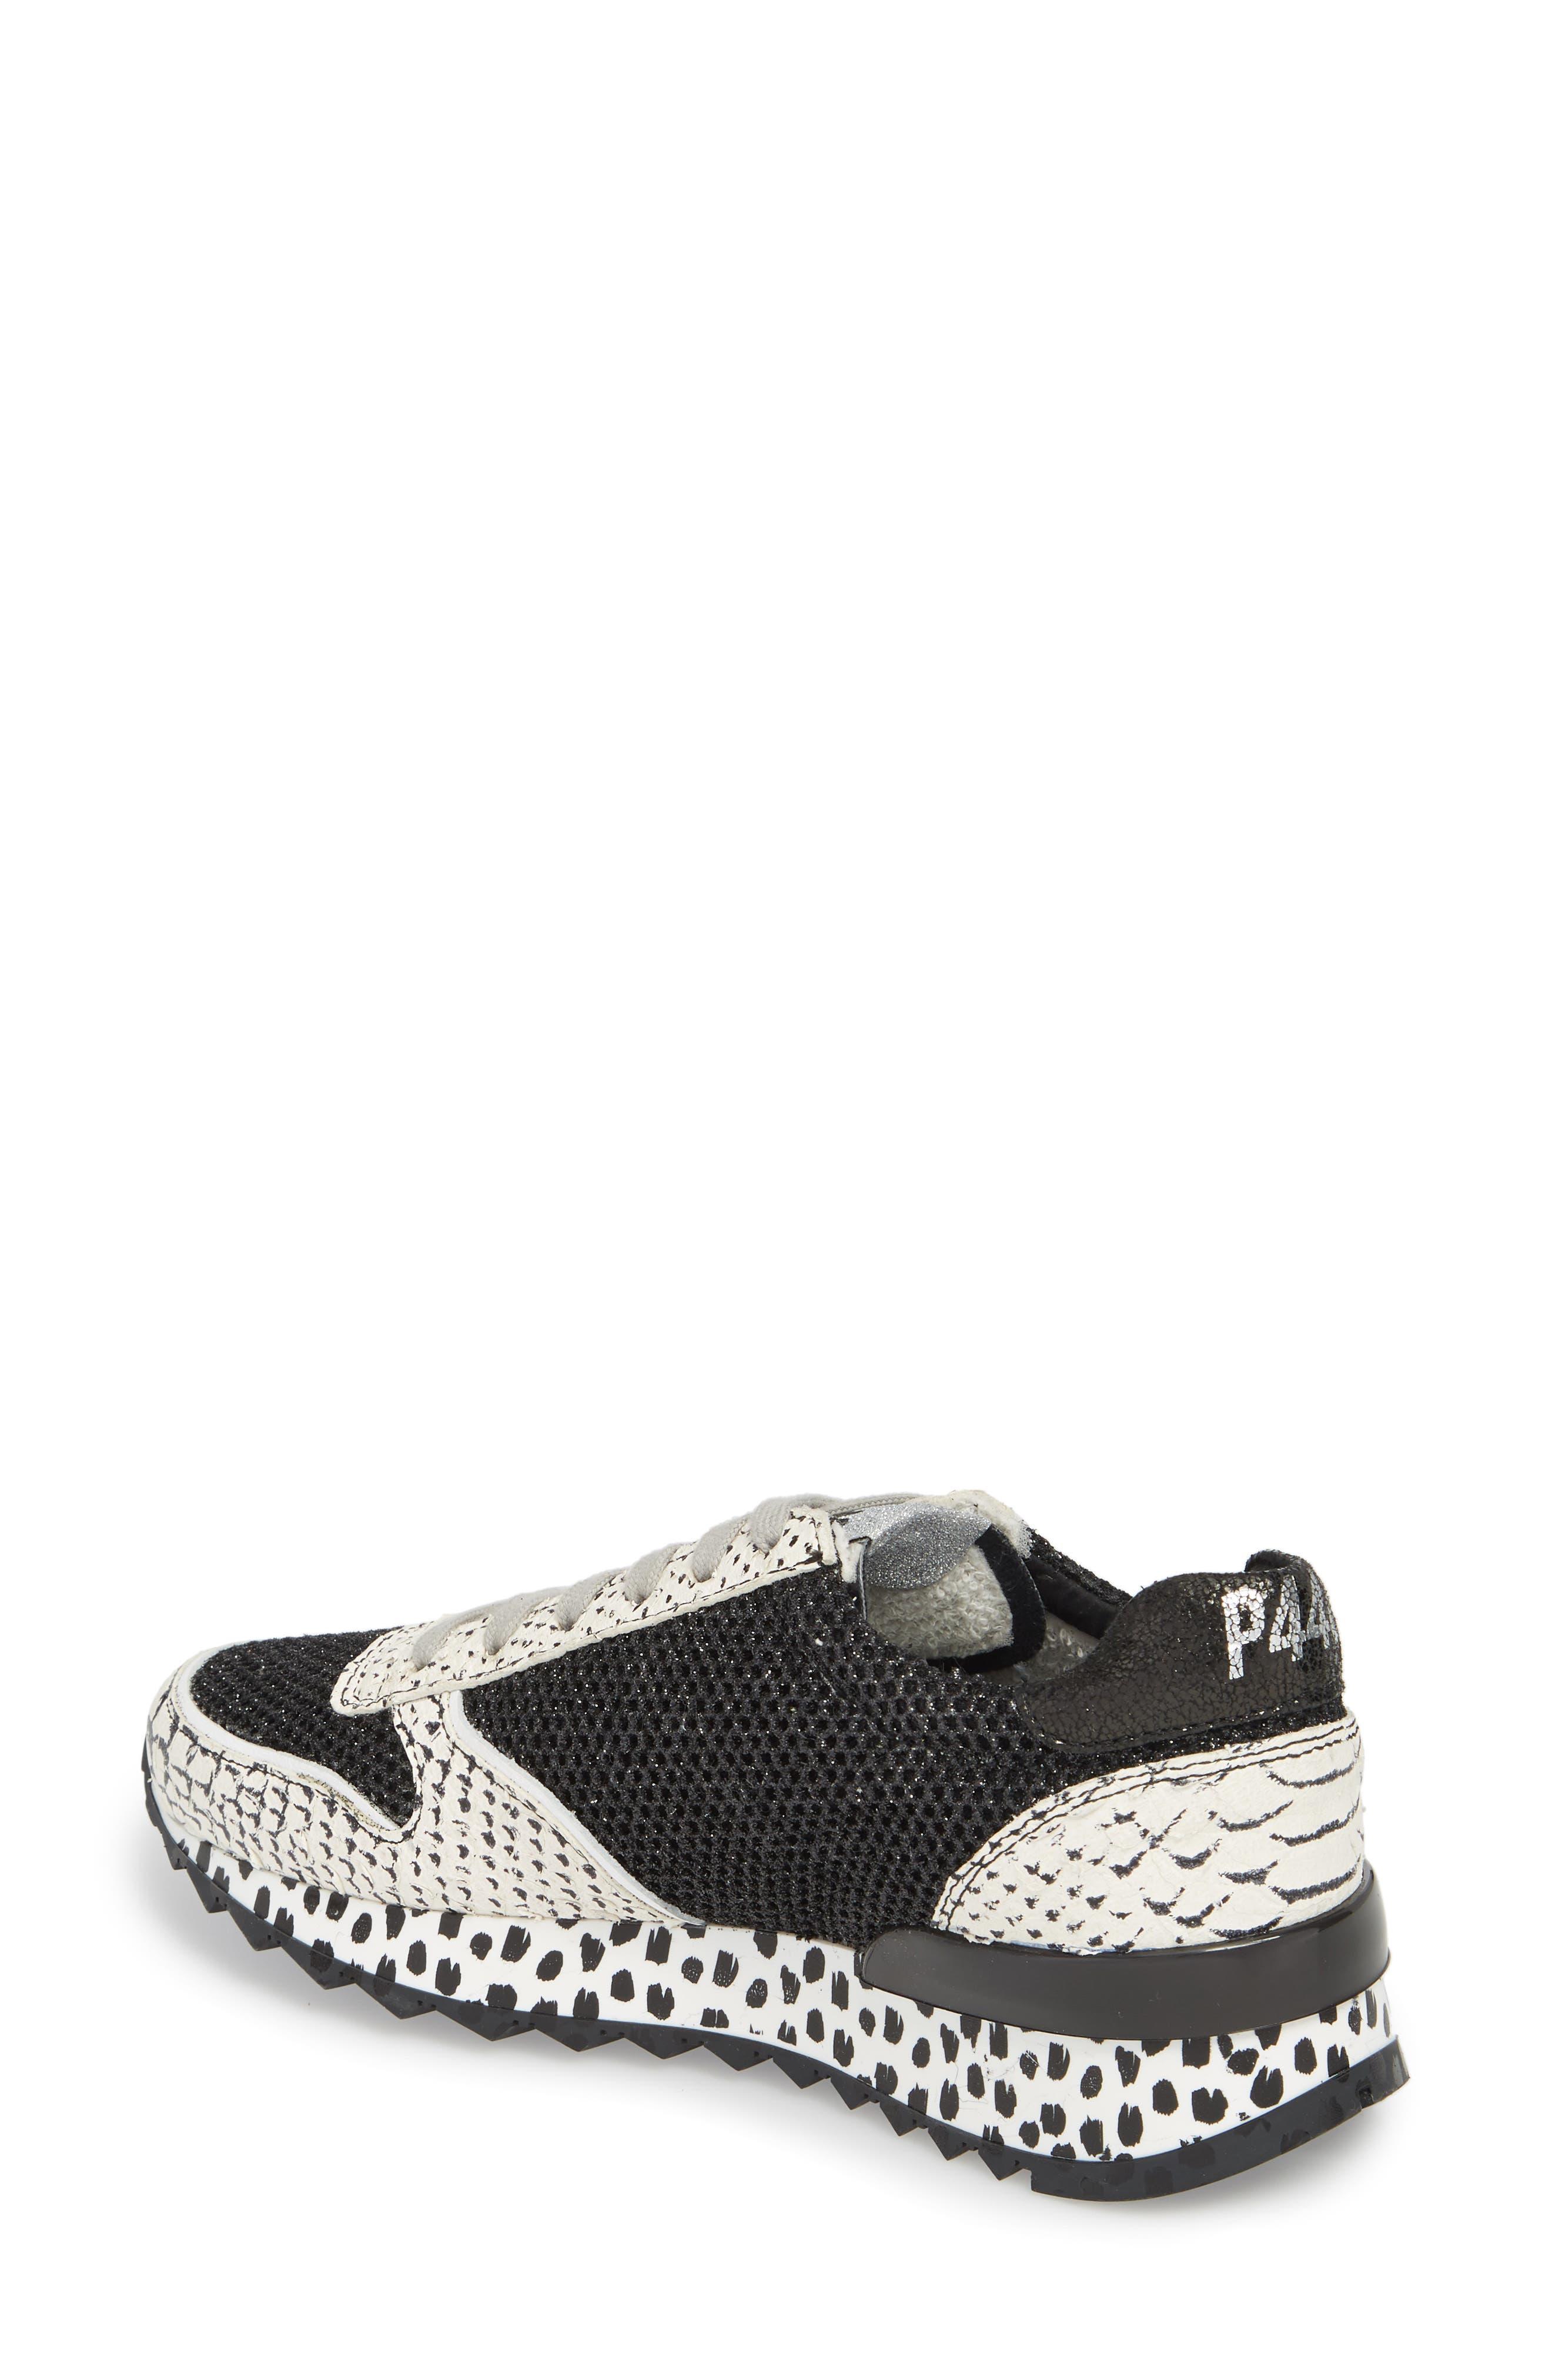 Boston Sneaker,                             Alternate thumbnail 2, color,                             Python